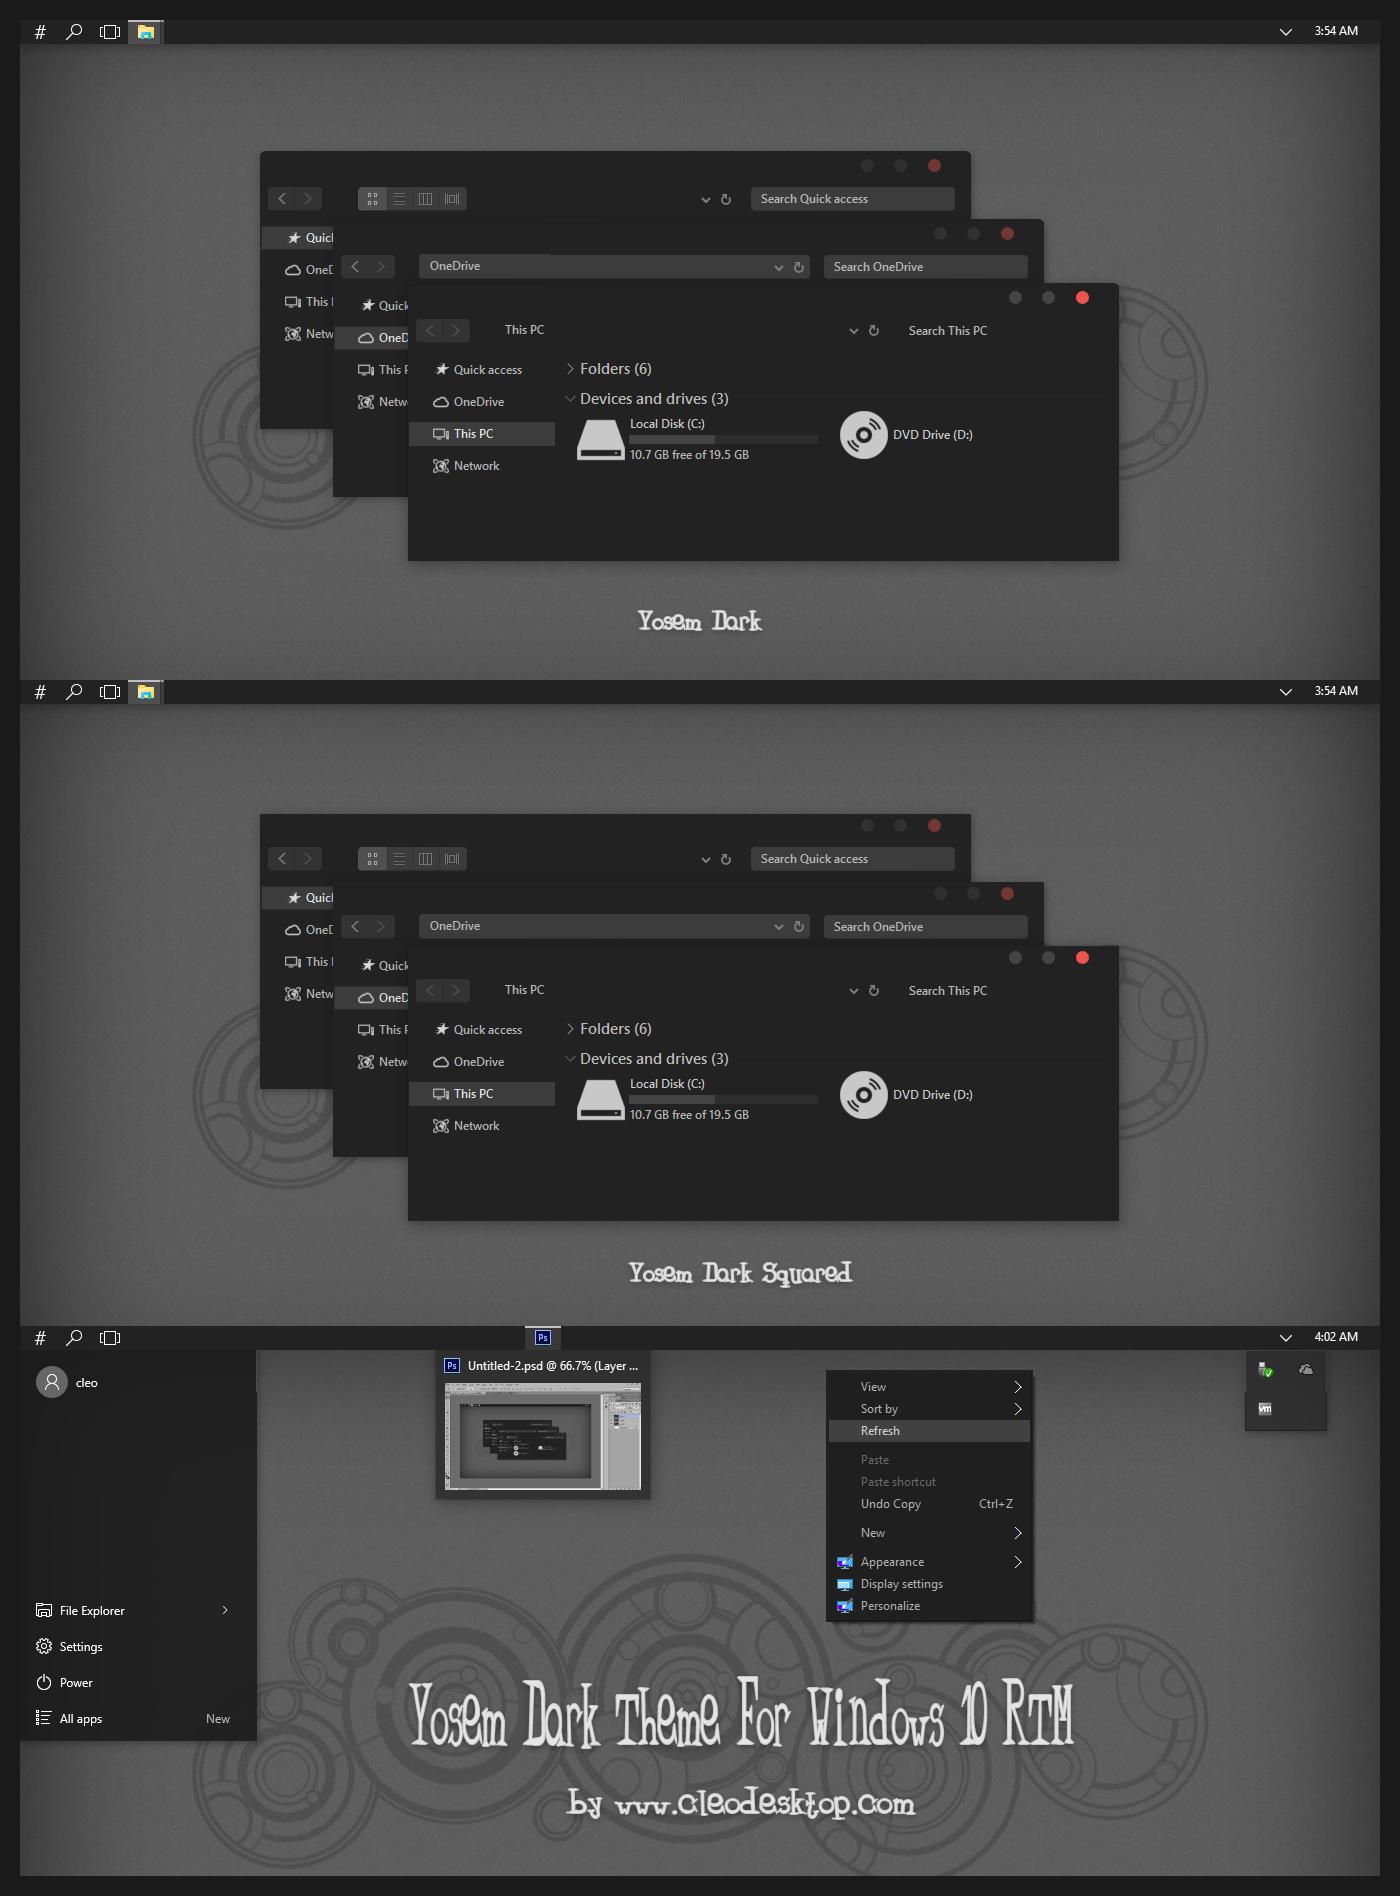 Yosem Dark Theme For Windows 10 RTM